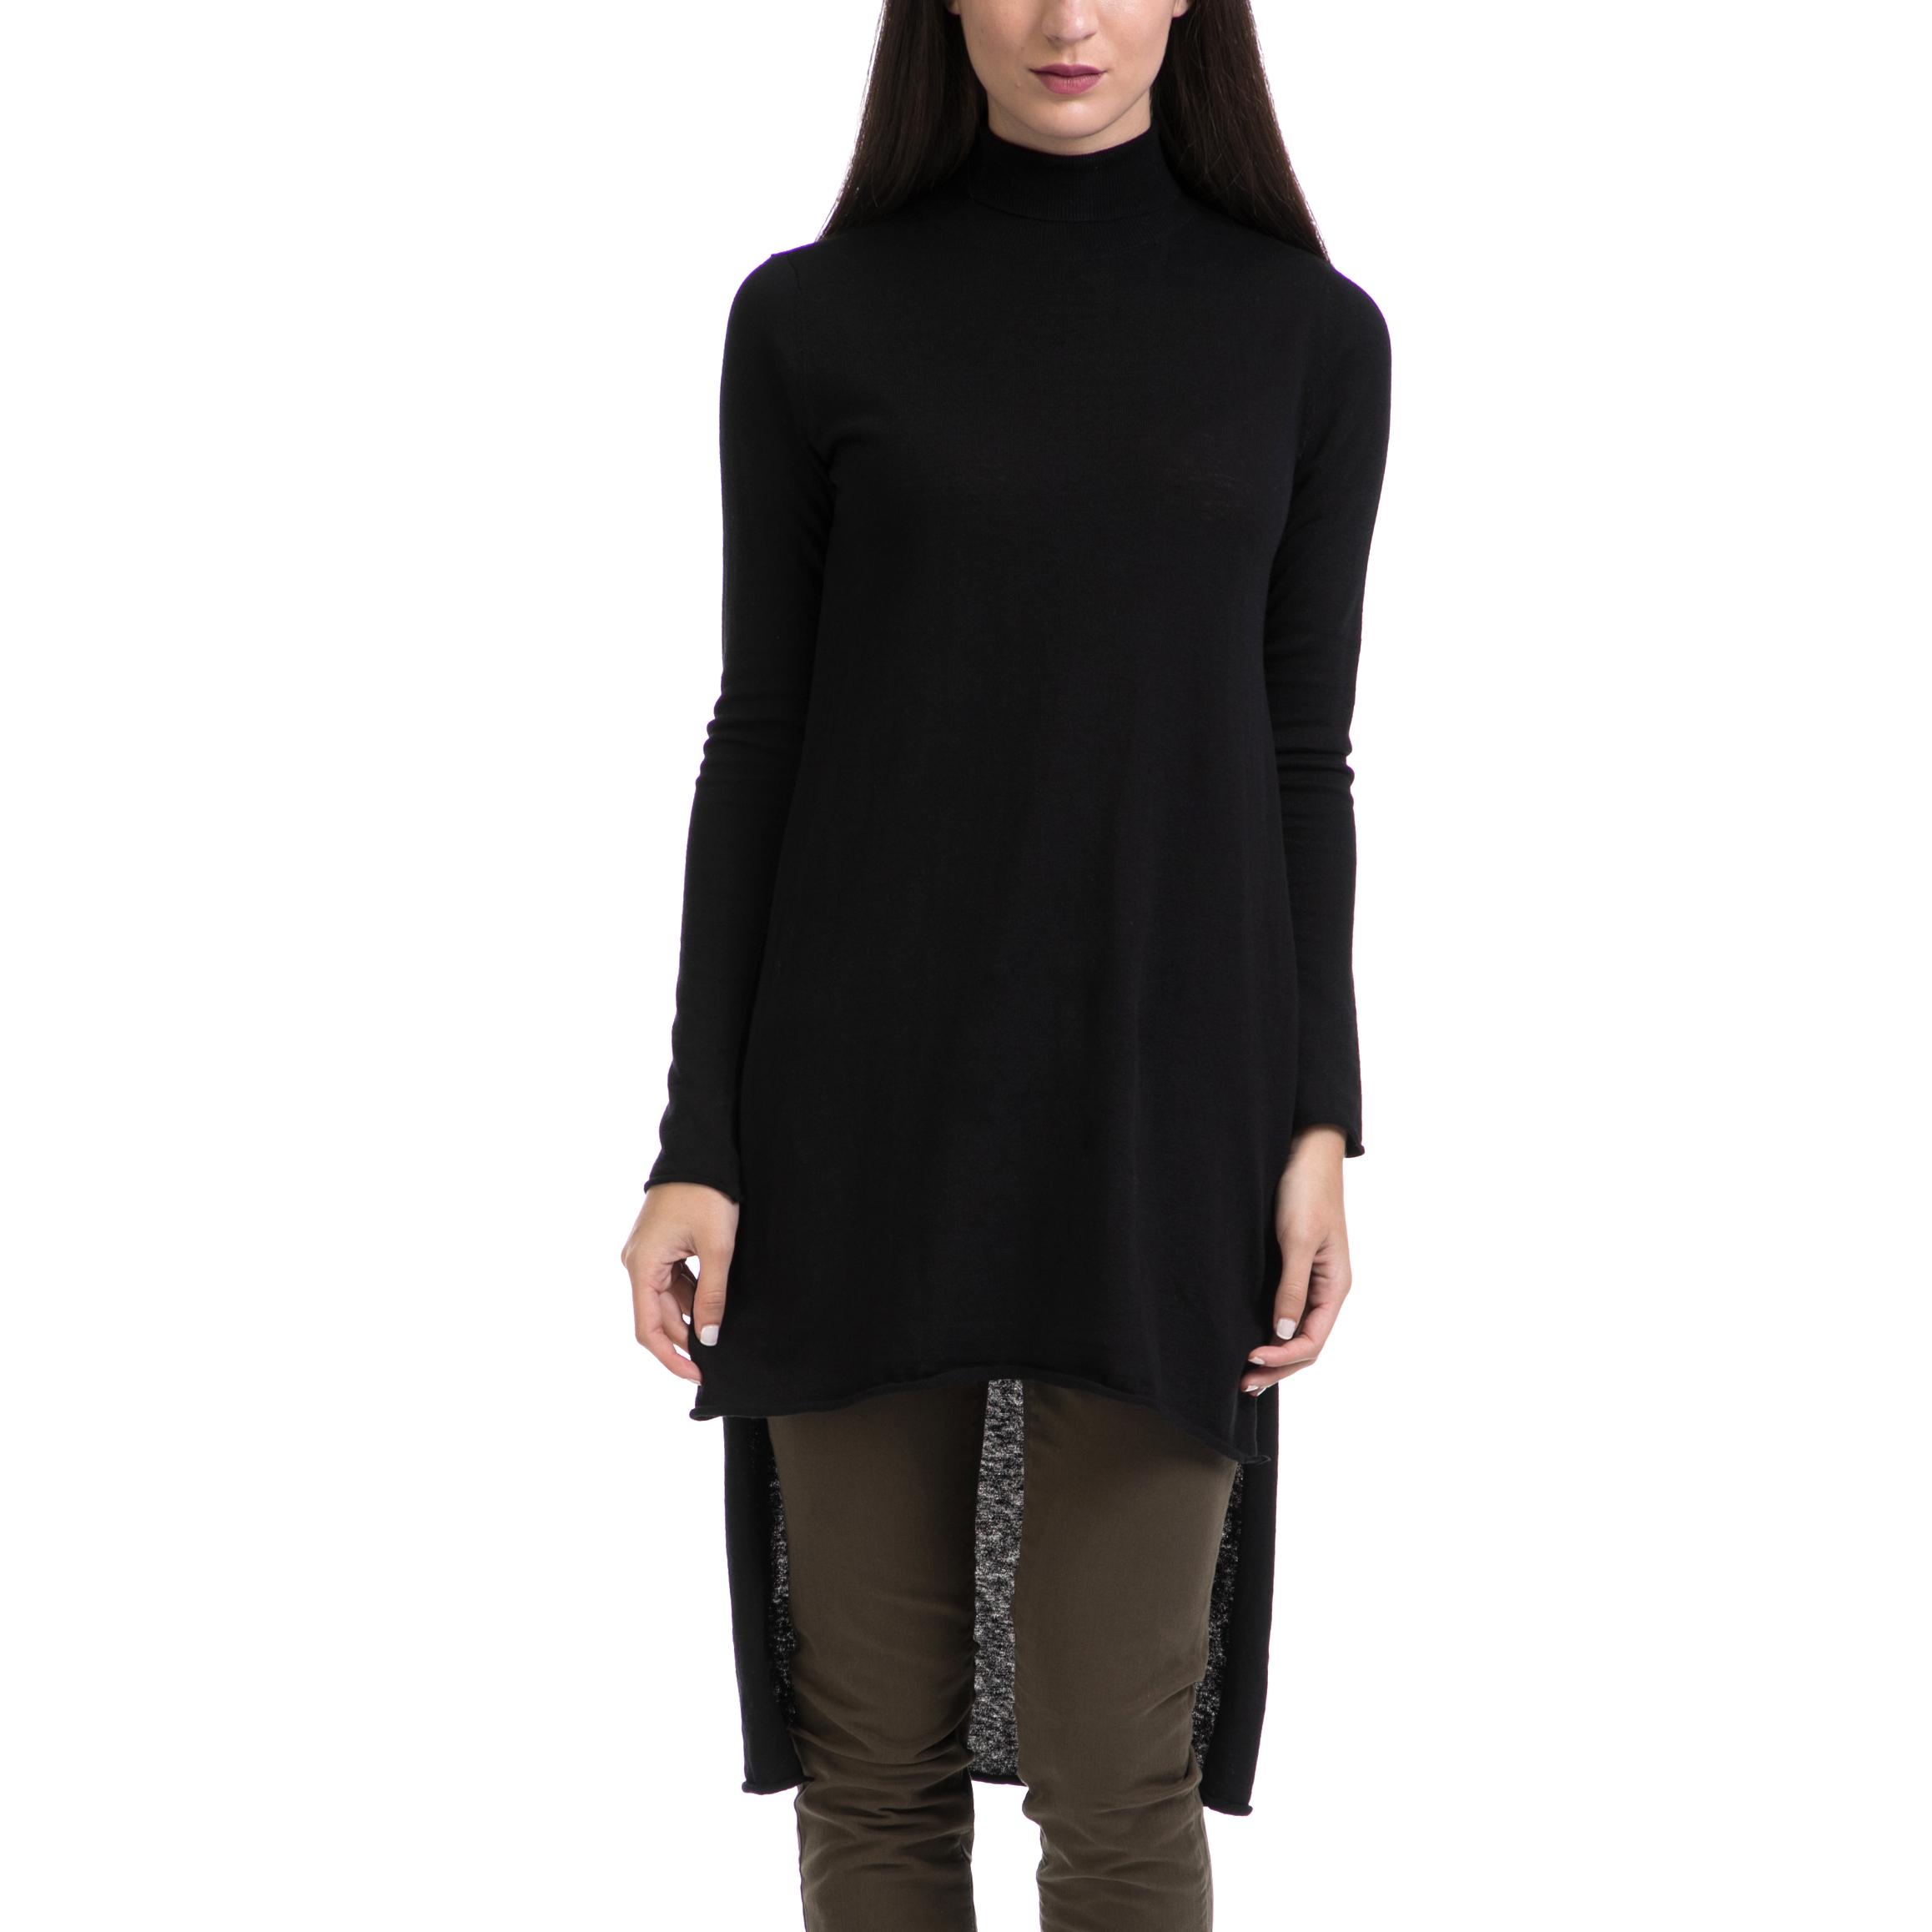 SCOTCH & SODA - Γυναικείο πουλόβερ MAISON SCOTCH μαύρο γυναικεία ρούχα πλεκτά ζακέτες πουλόβερ